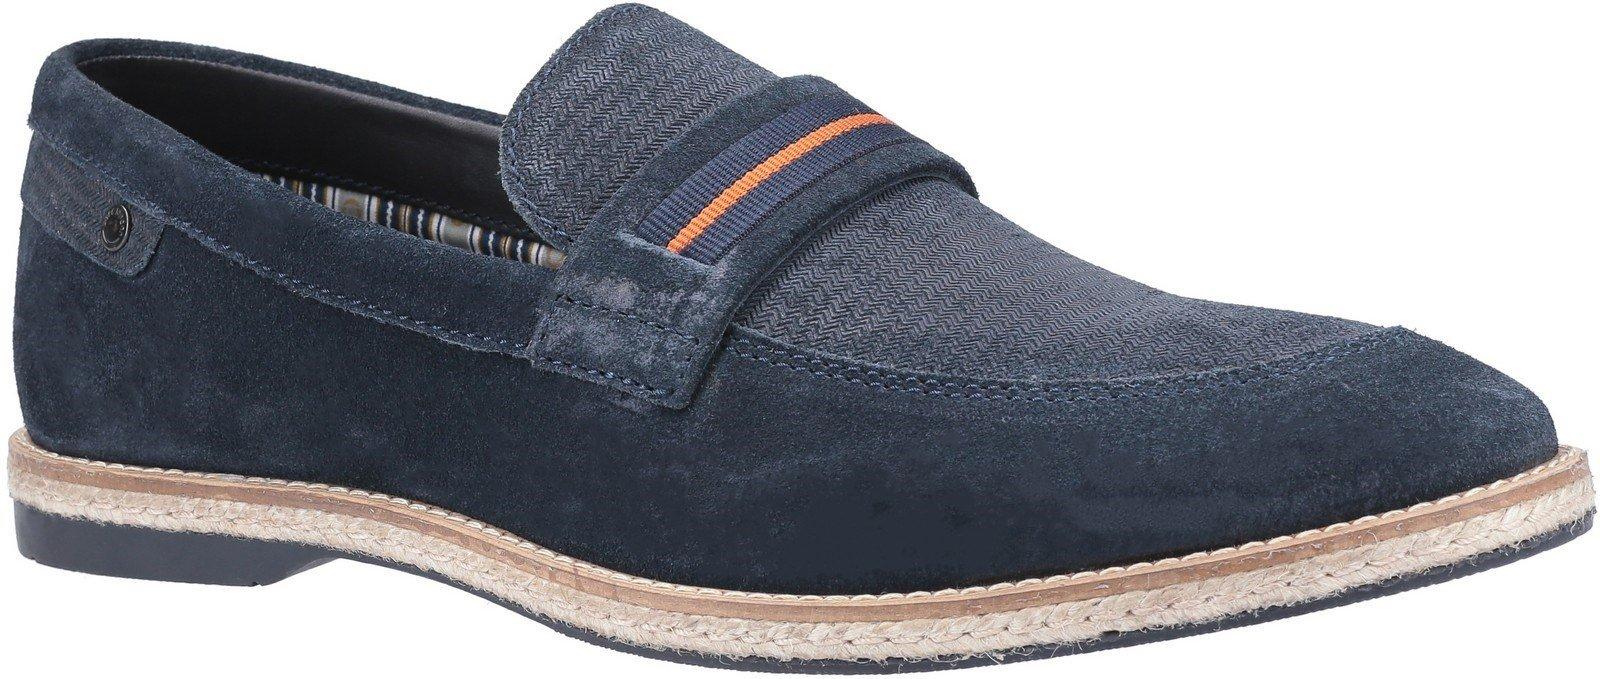 Base London Men's Kinsey Suede Slip On Loafer Various Colours 30444 - Navy 6